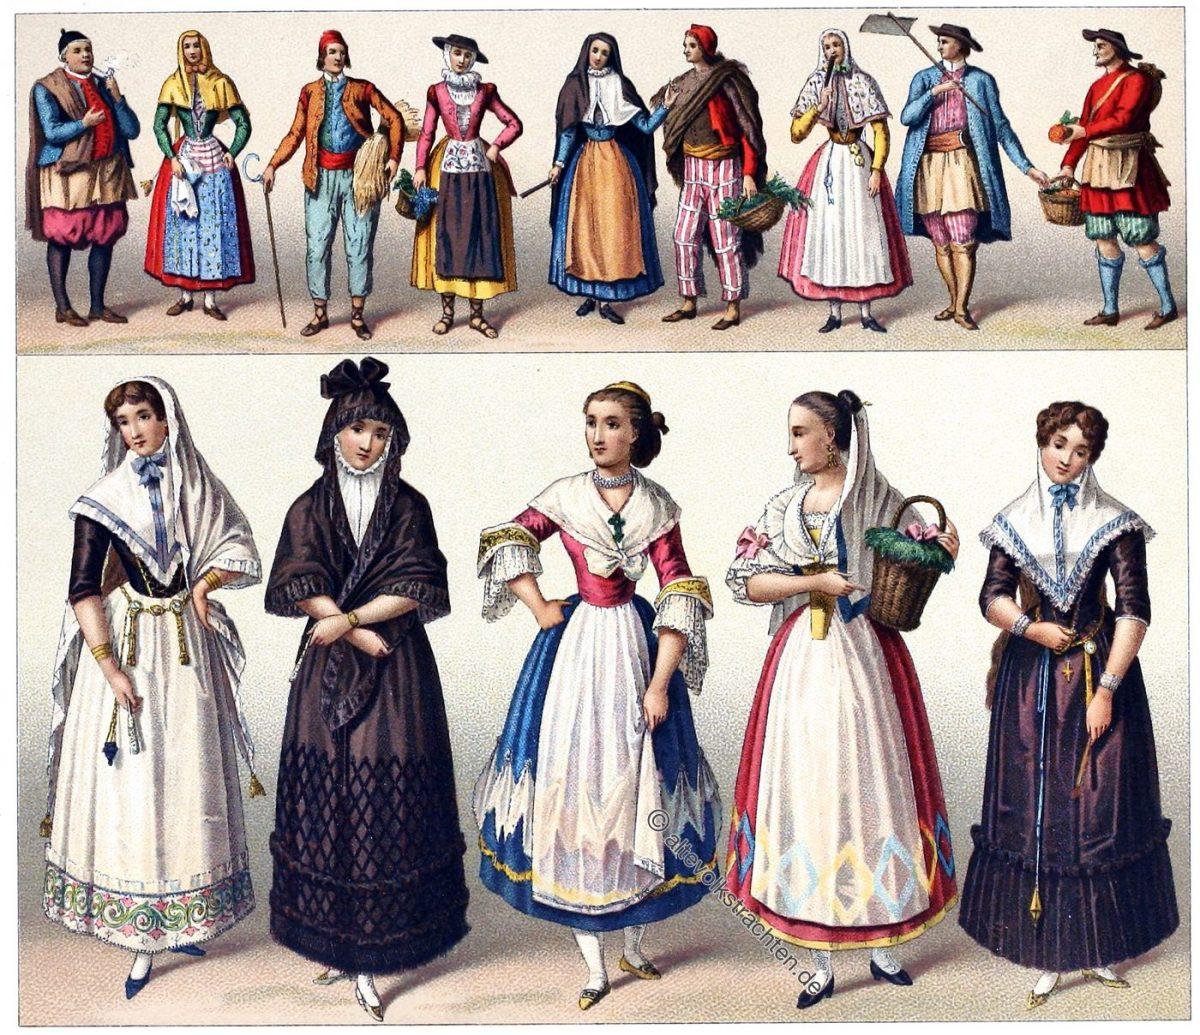 Rebozillo, Trachten, Volkstrachten, Balearen, Ibiza, Mallorca, Minorca, Pityusen, Espagne, Spanien, Racinet